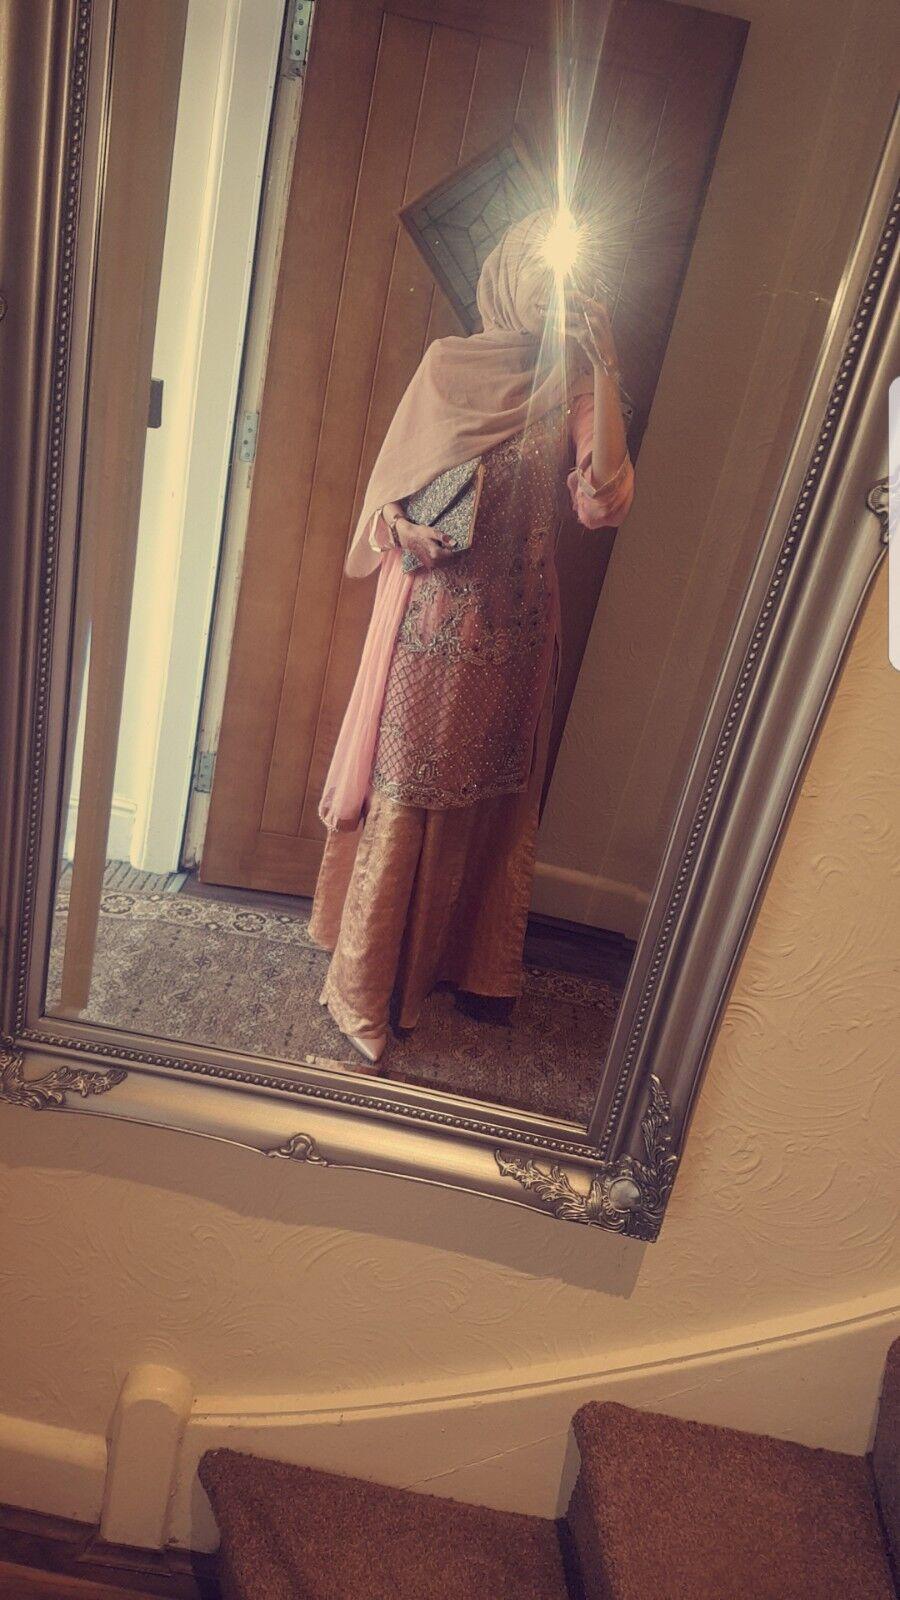 Indiano Pakistano Da Matrimonio Suit Lengha Bollywood Bollywood Bollywood Kameez Gonna Abito cucite c40428